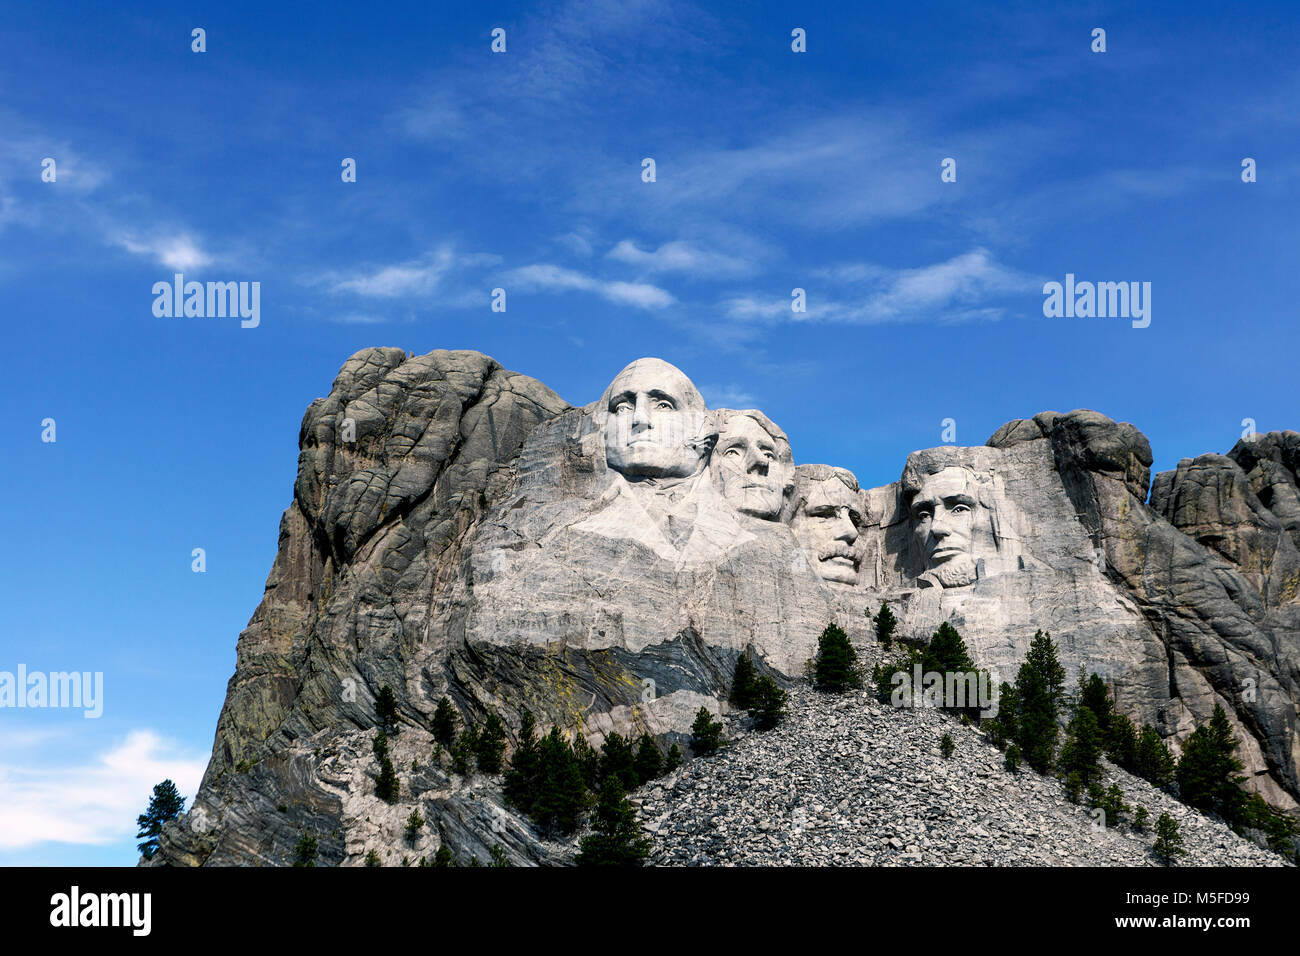 SD00028-00...SOUTH DAKOTA - Presedents Georg Washington, Thomas Jefferson, Theodore Roosevelt and Abraham Lincoln - Stock Image